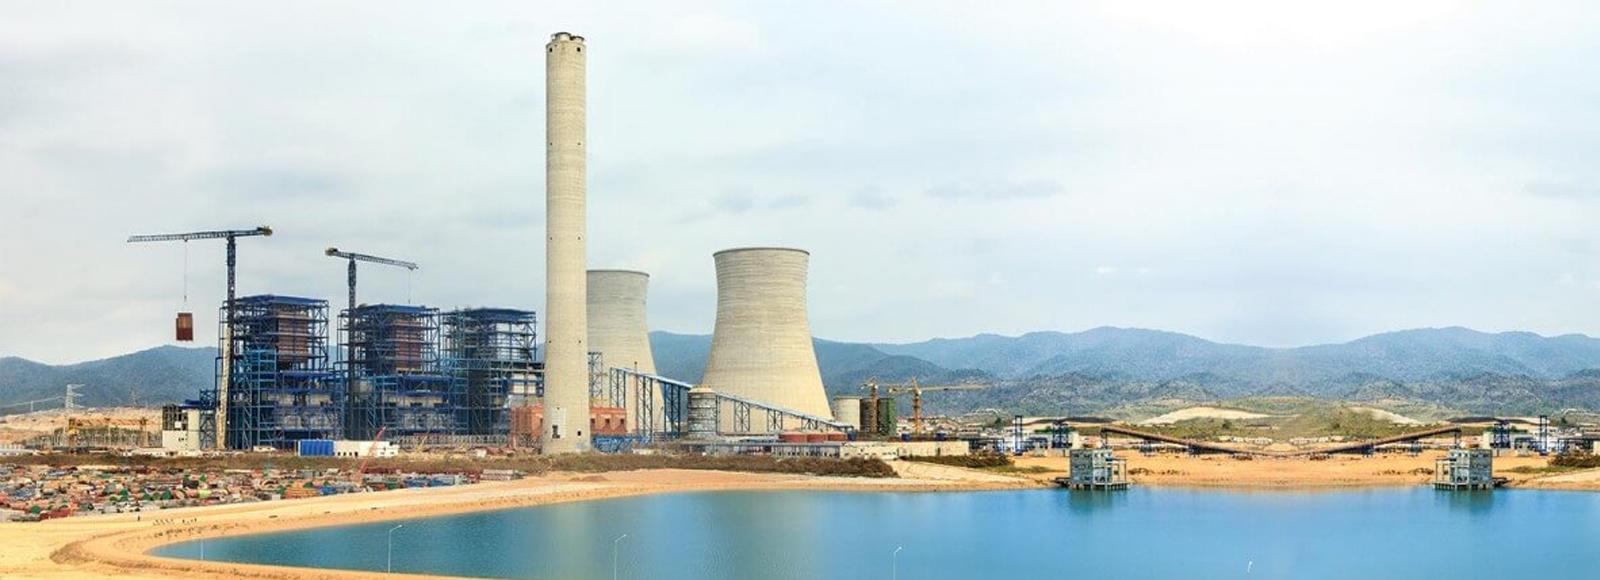 Power plant chimney - header